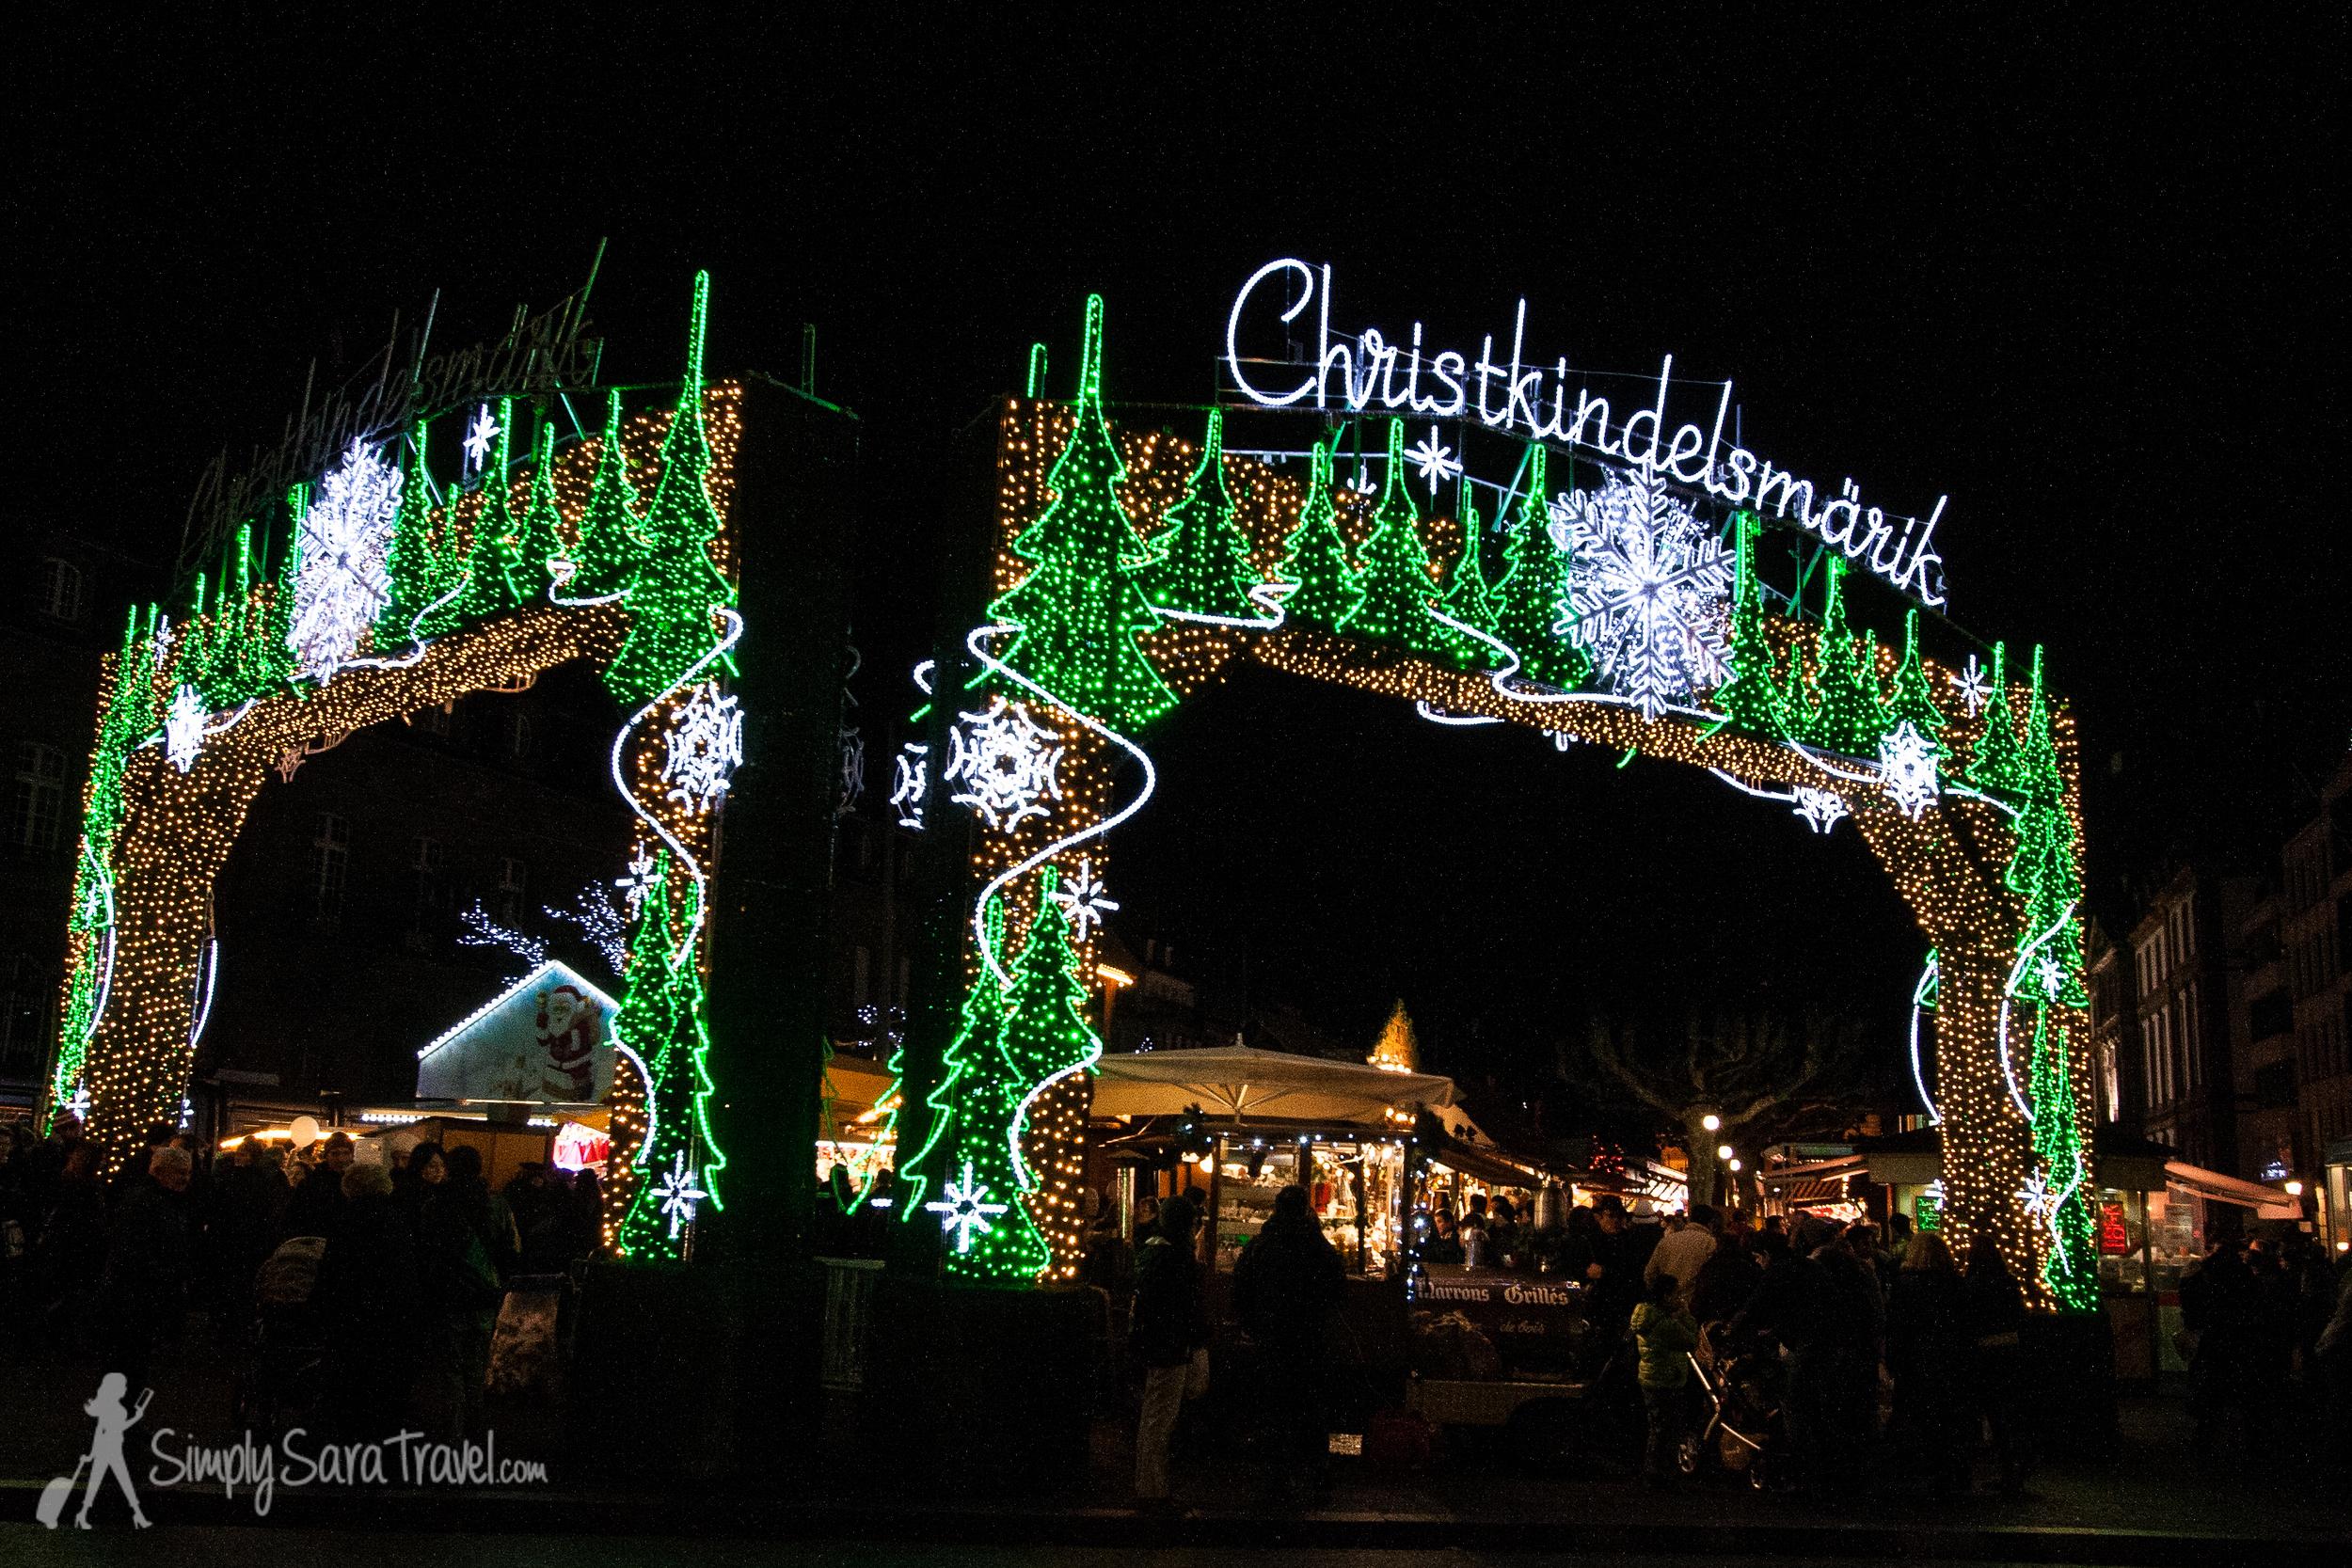 The Christmas market Christkindelmarik, in Strasbourg, France